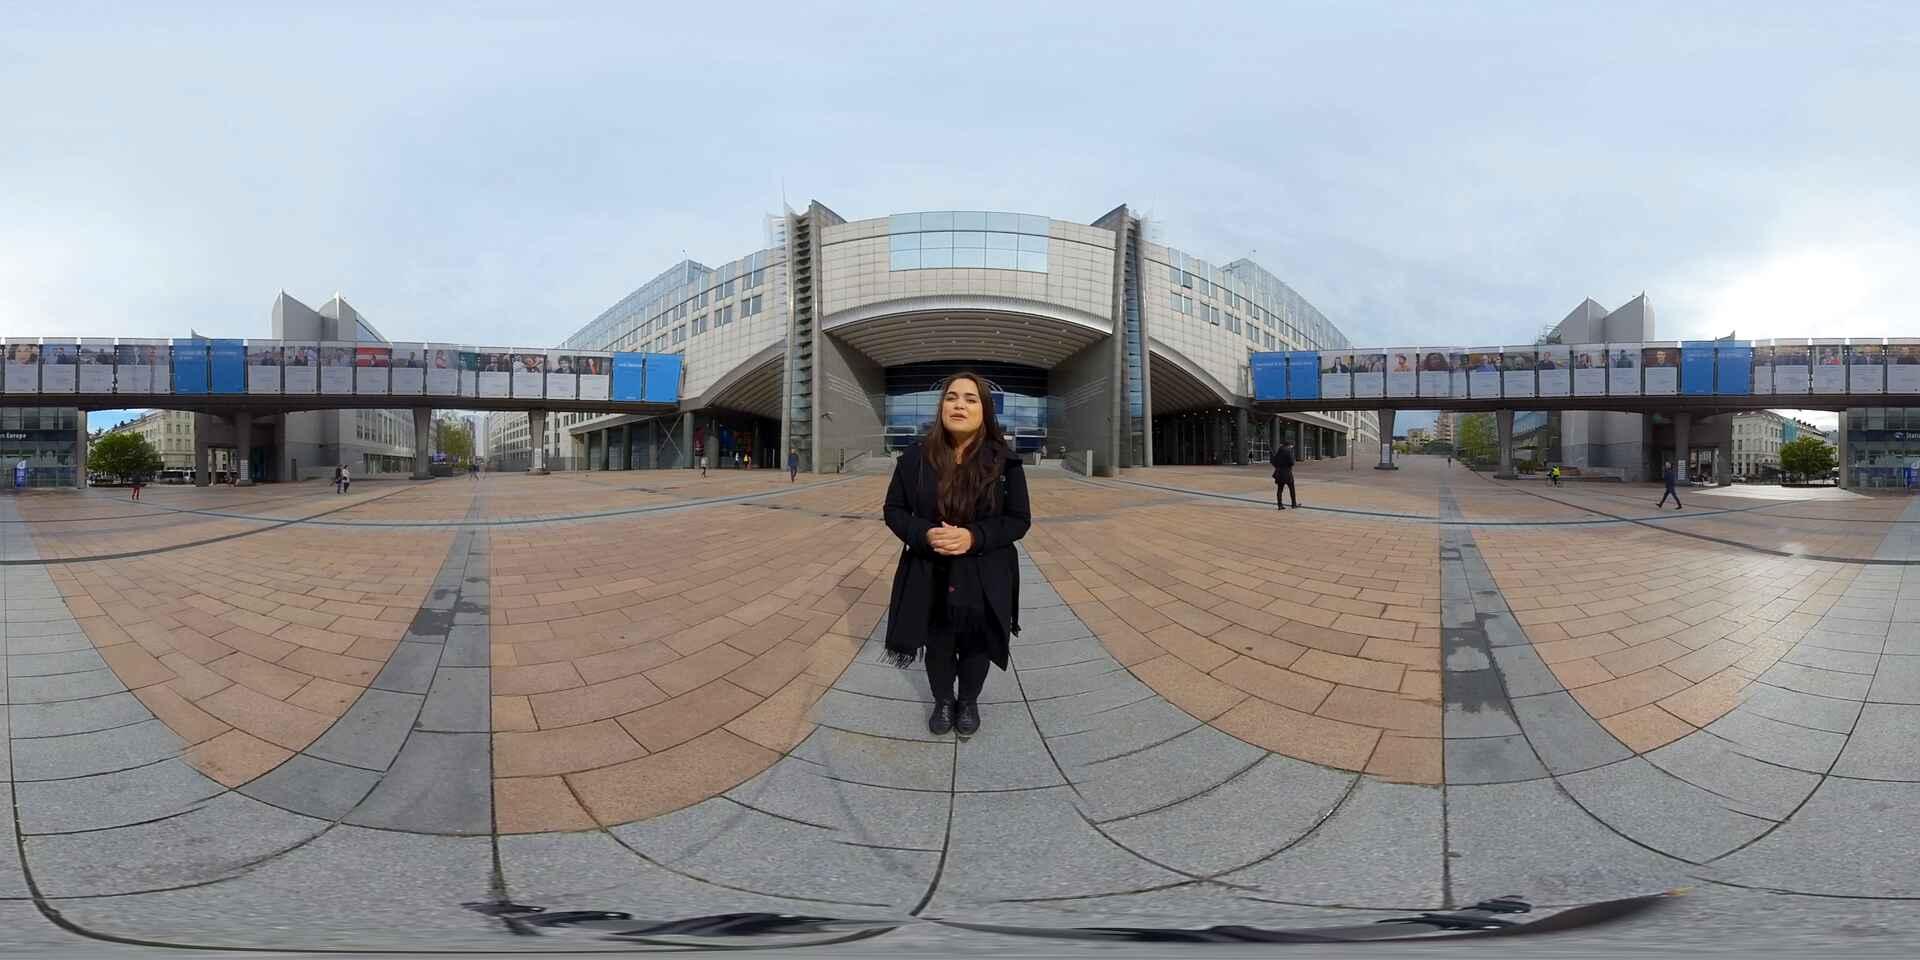 Take an interactive tour of the European Parliament